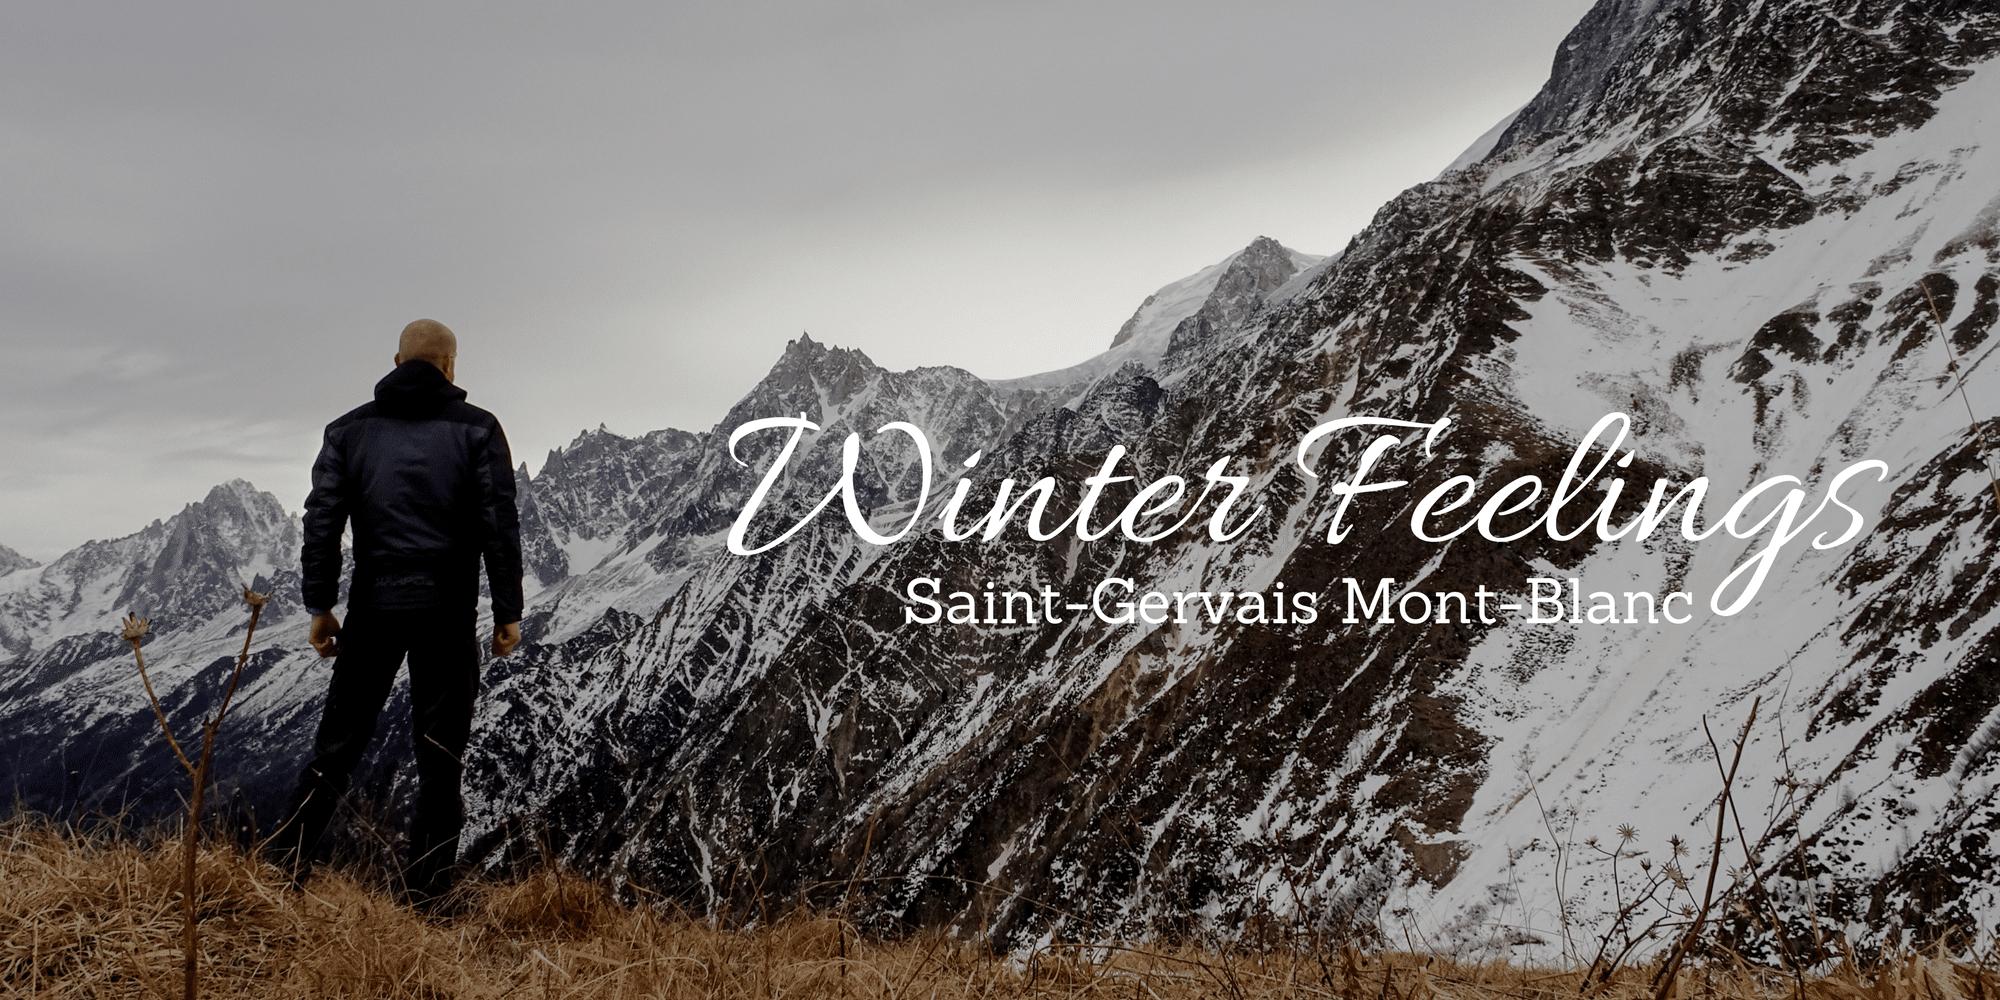 Saint-Gervais Mont-Blanc : Winter Feelings